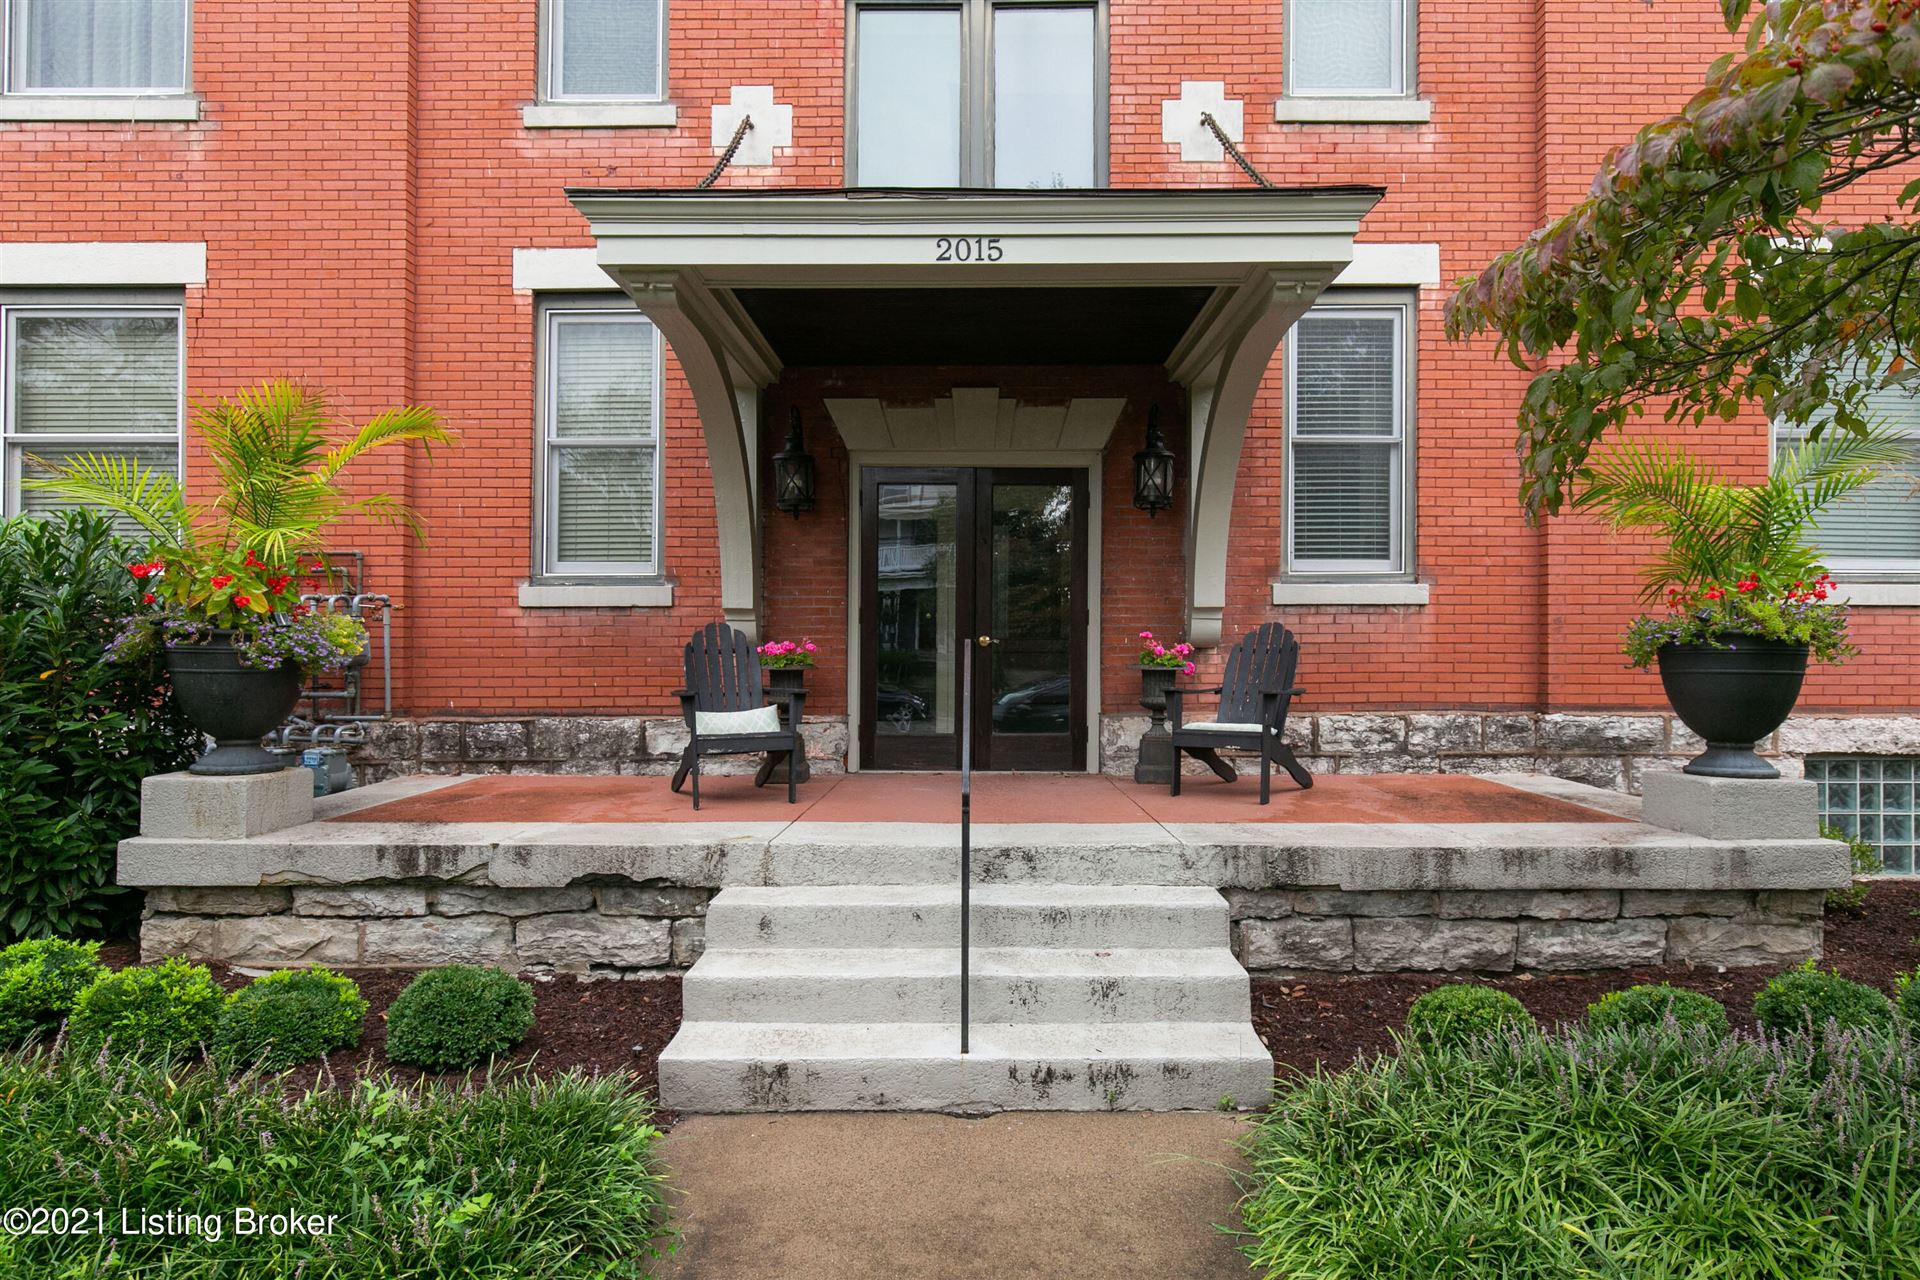 Photo for 2015 Bonnycastle Ave #301, Louisville, KY 40205 (MLS # 1598594)